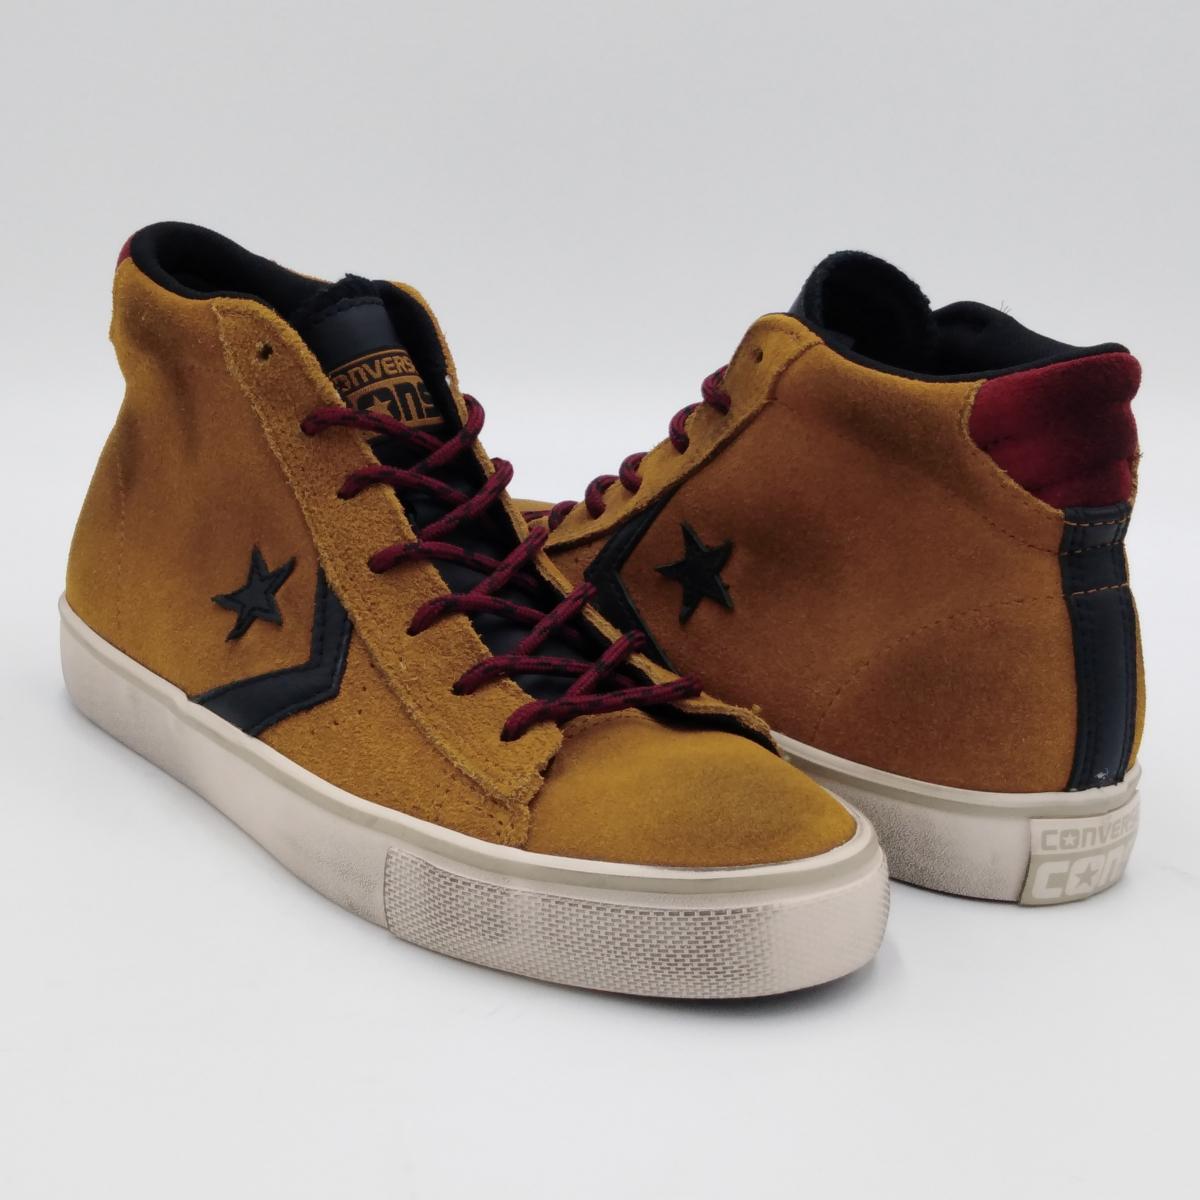 Converse -Pro Leather Vulc...